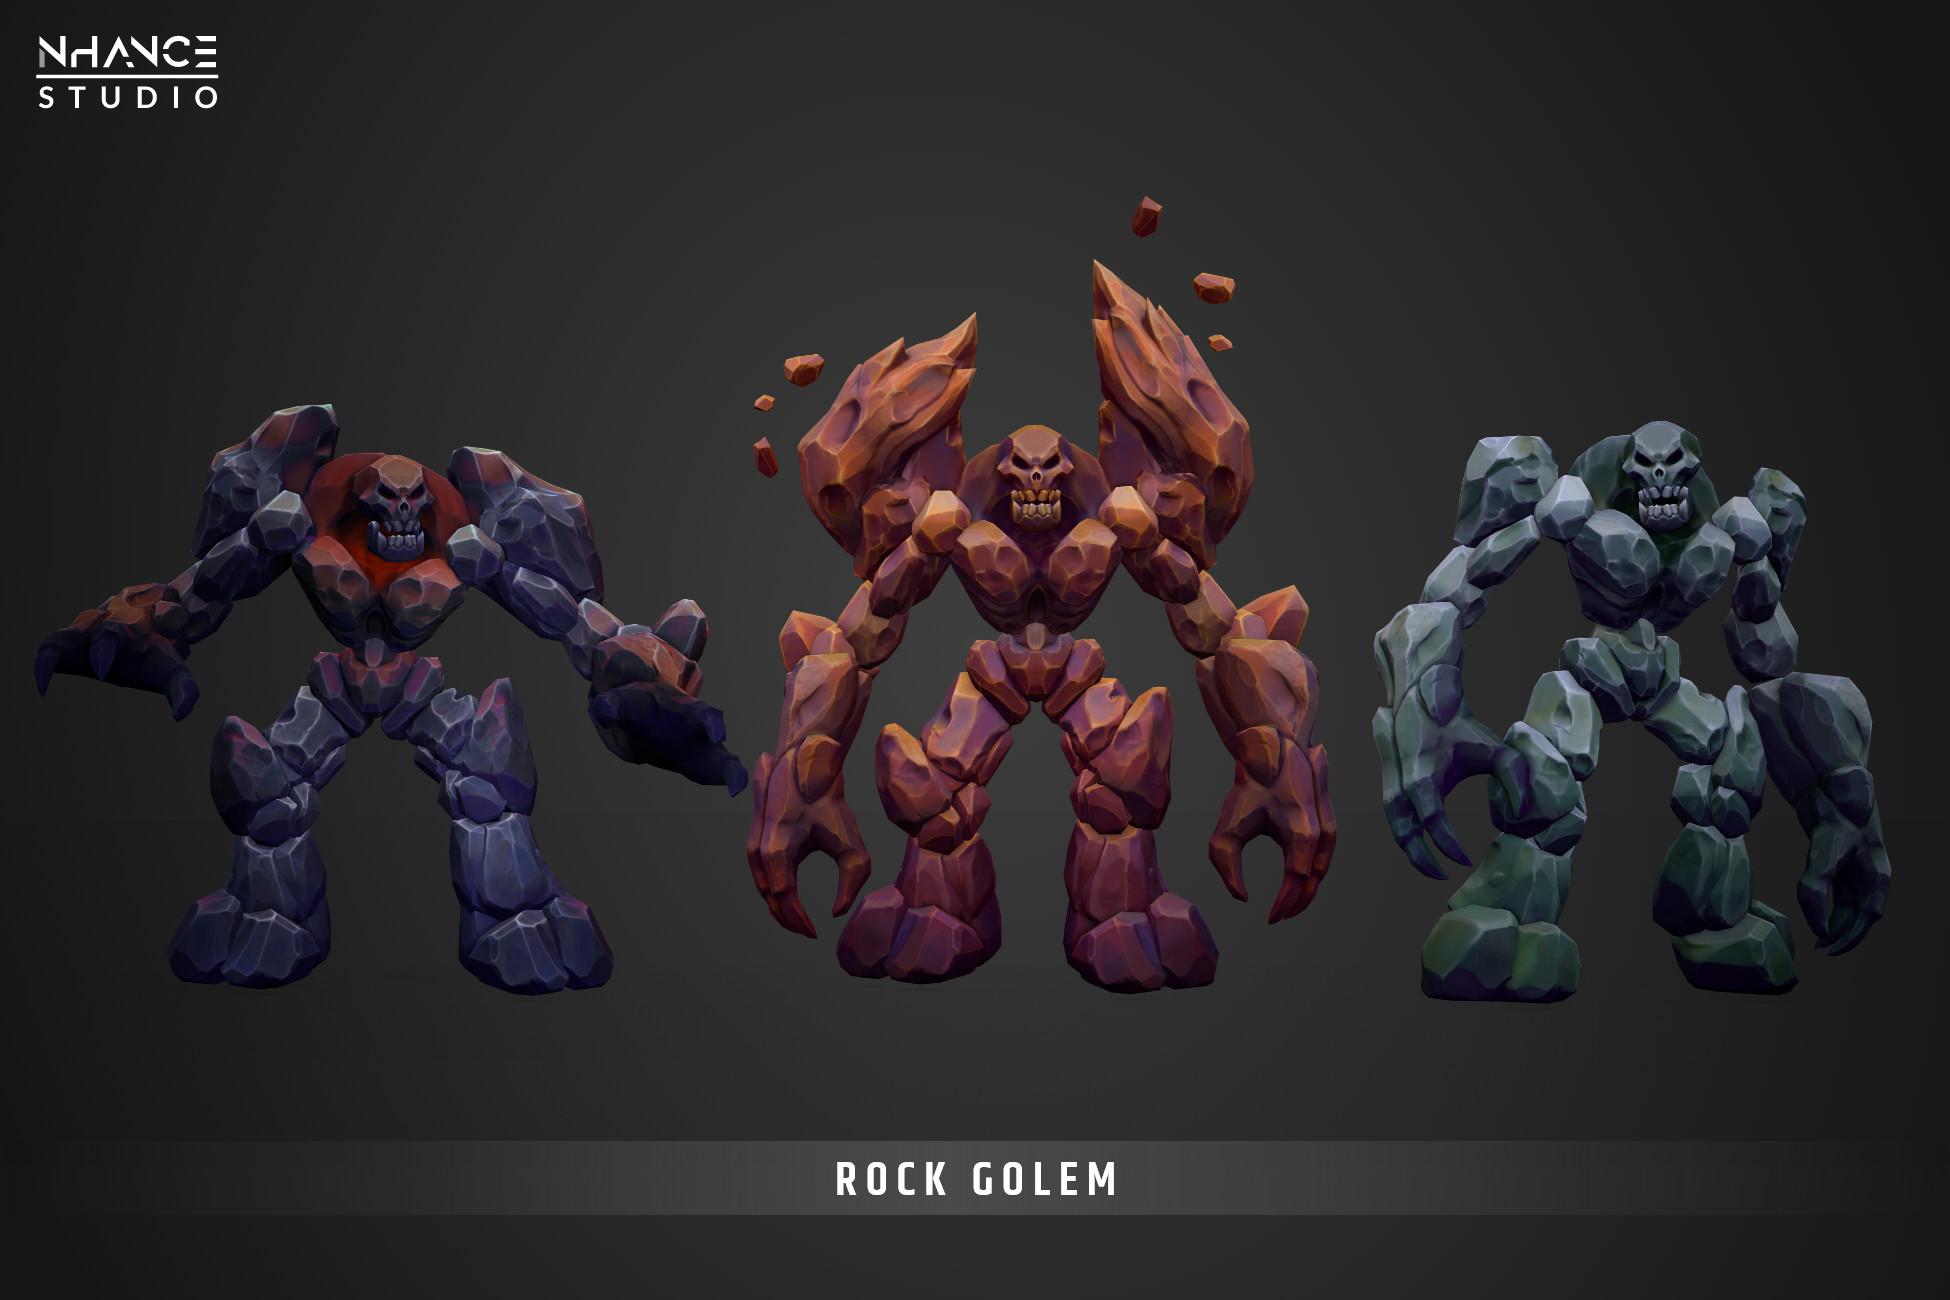 Modular Stylized Fantasy Rock Golem